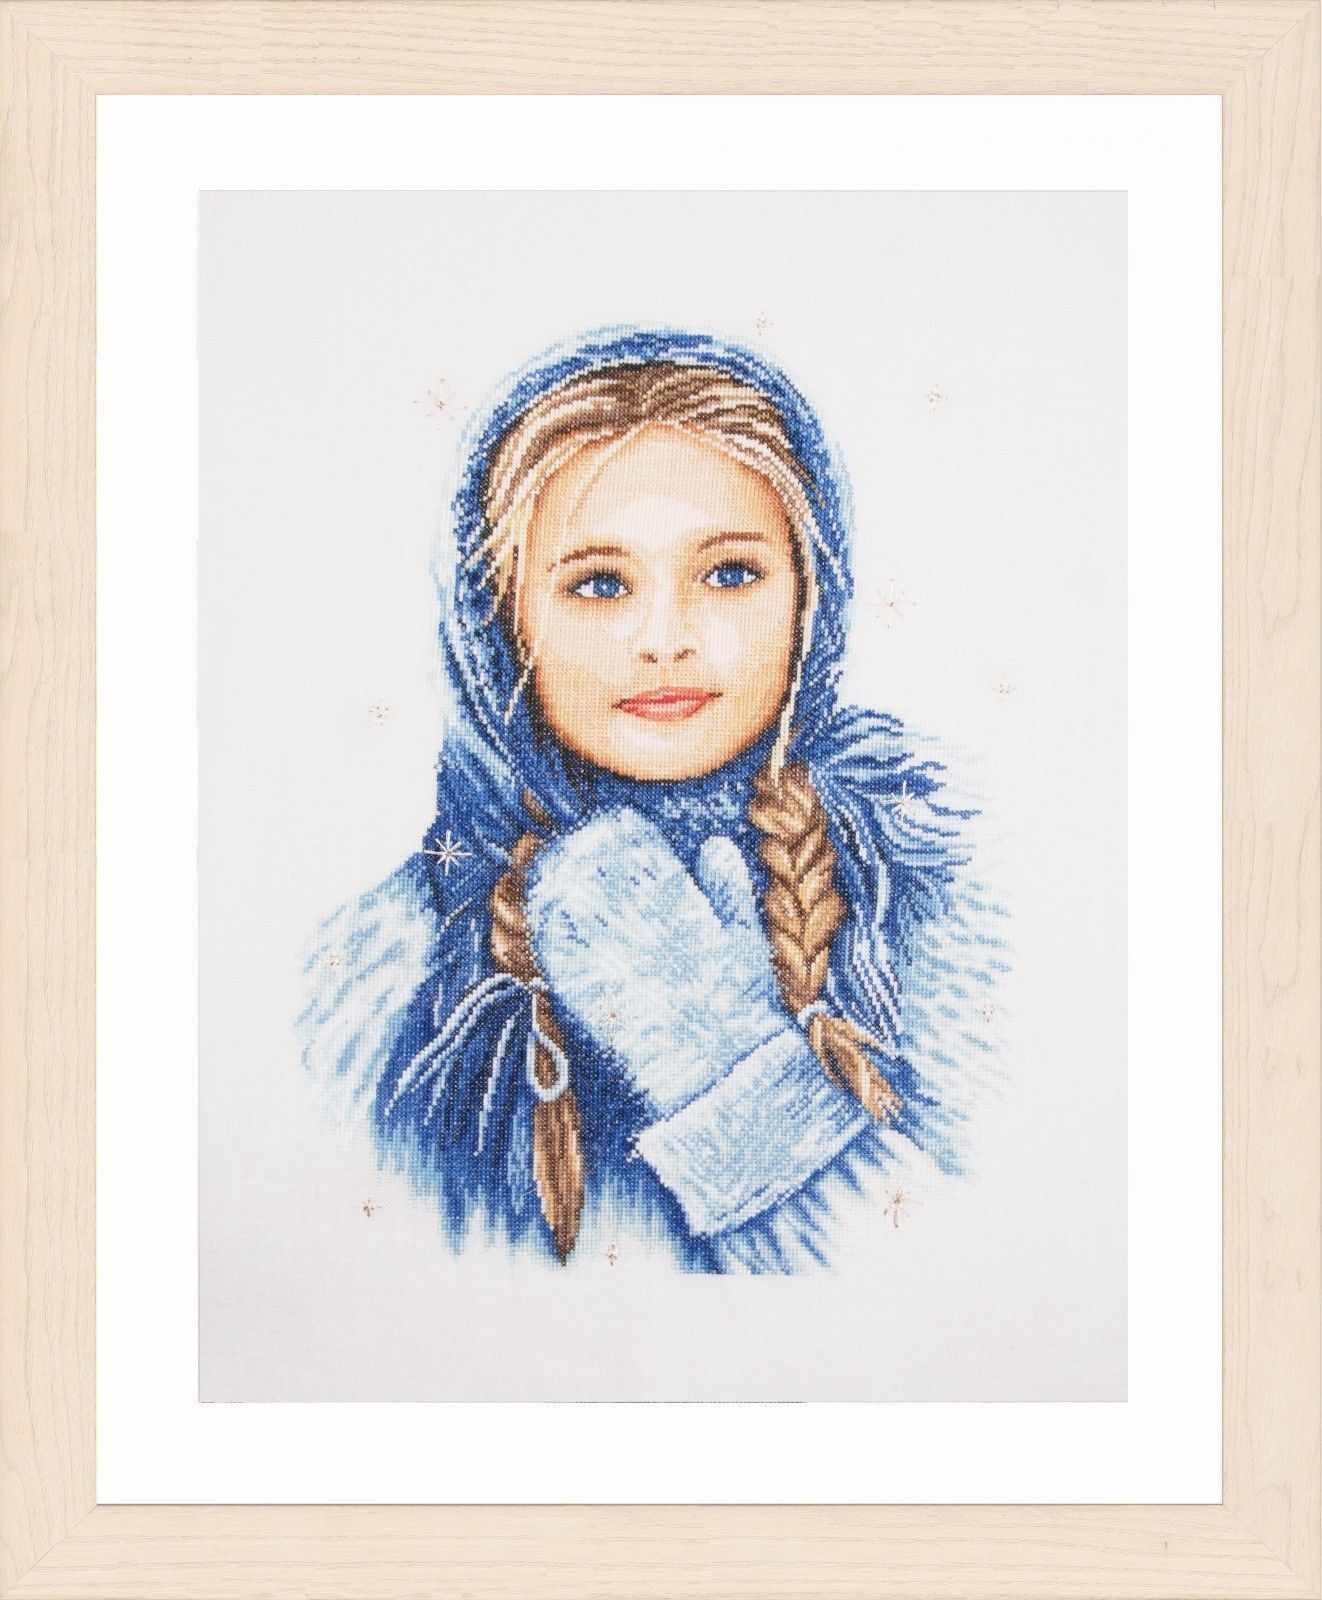 PN-0169674 Winter Girl (Lanarte)